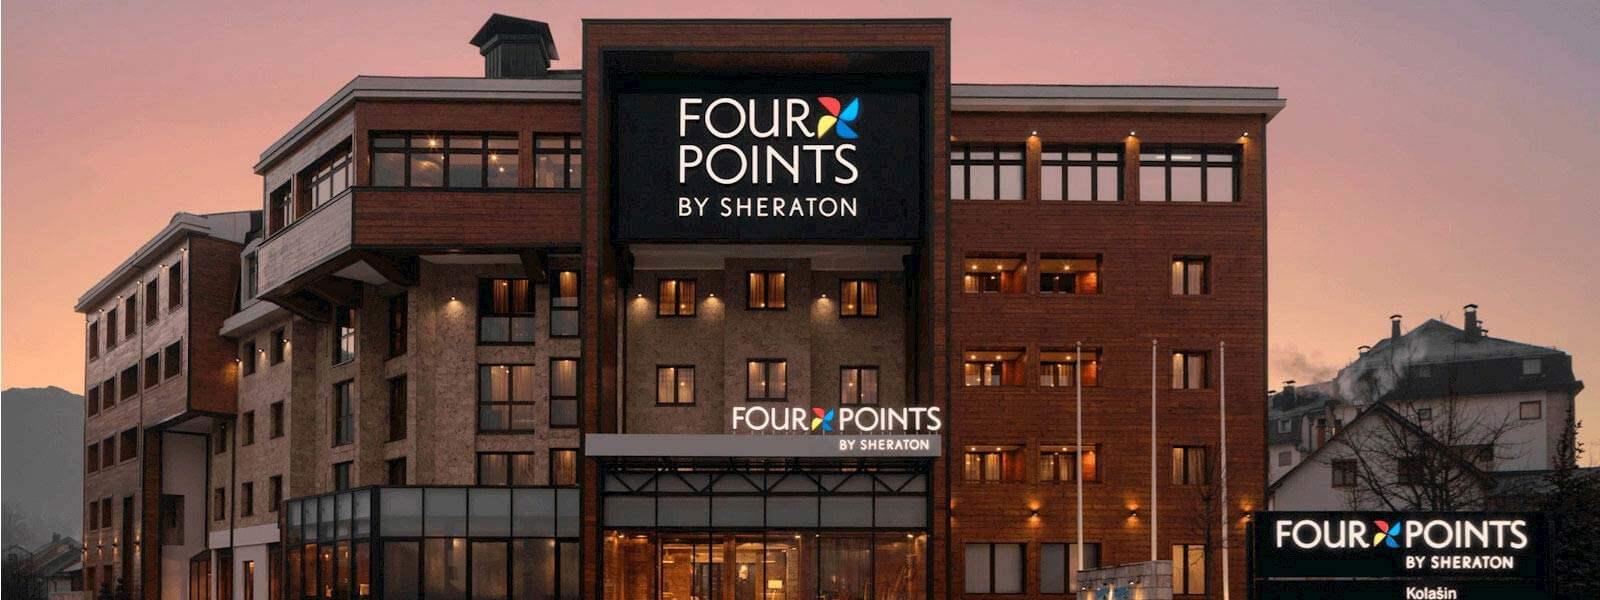 Four Points By Sheraton Kolasin